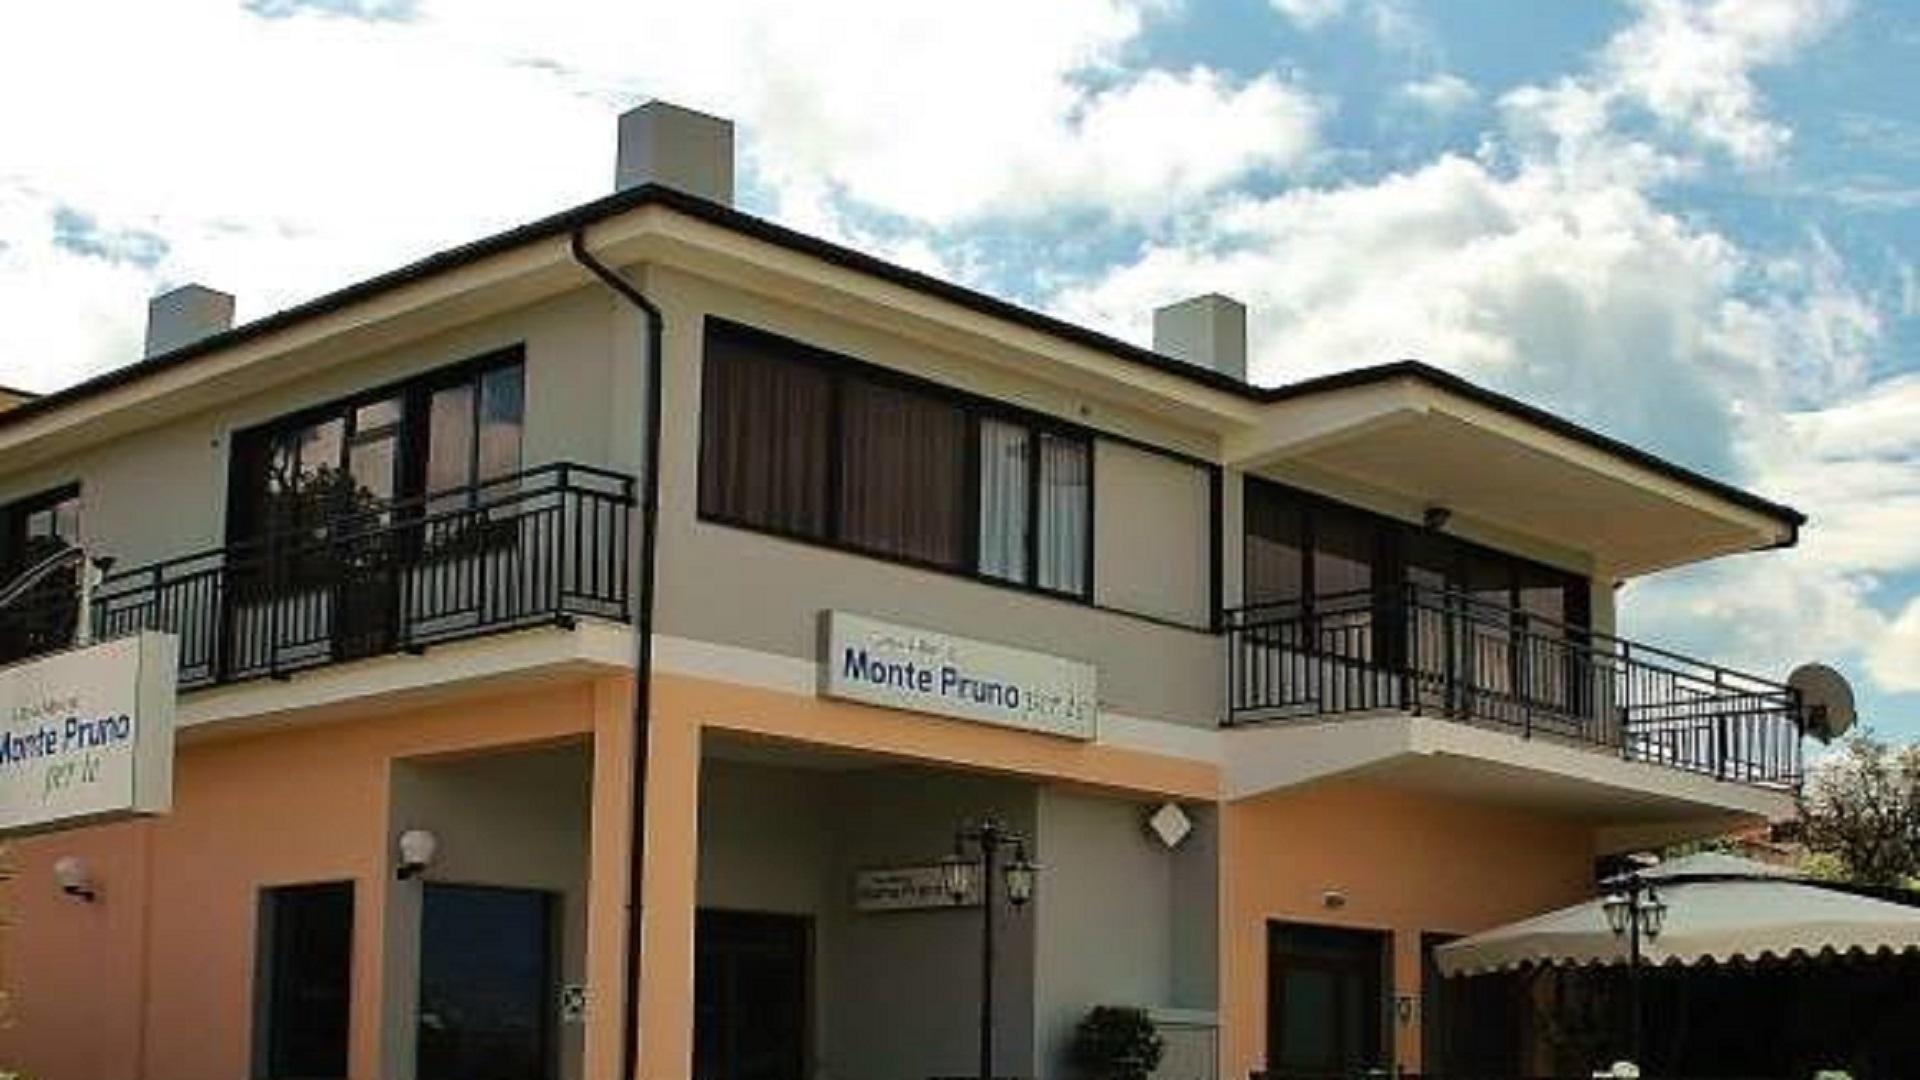 casa albergo monte pruno